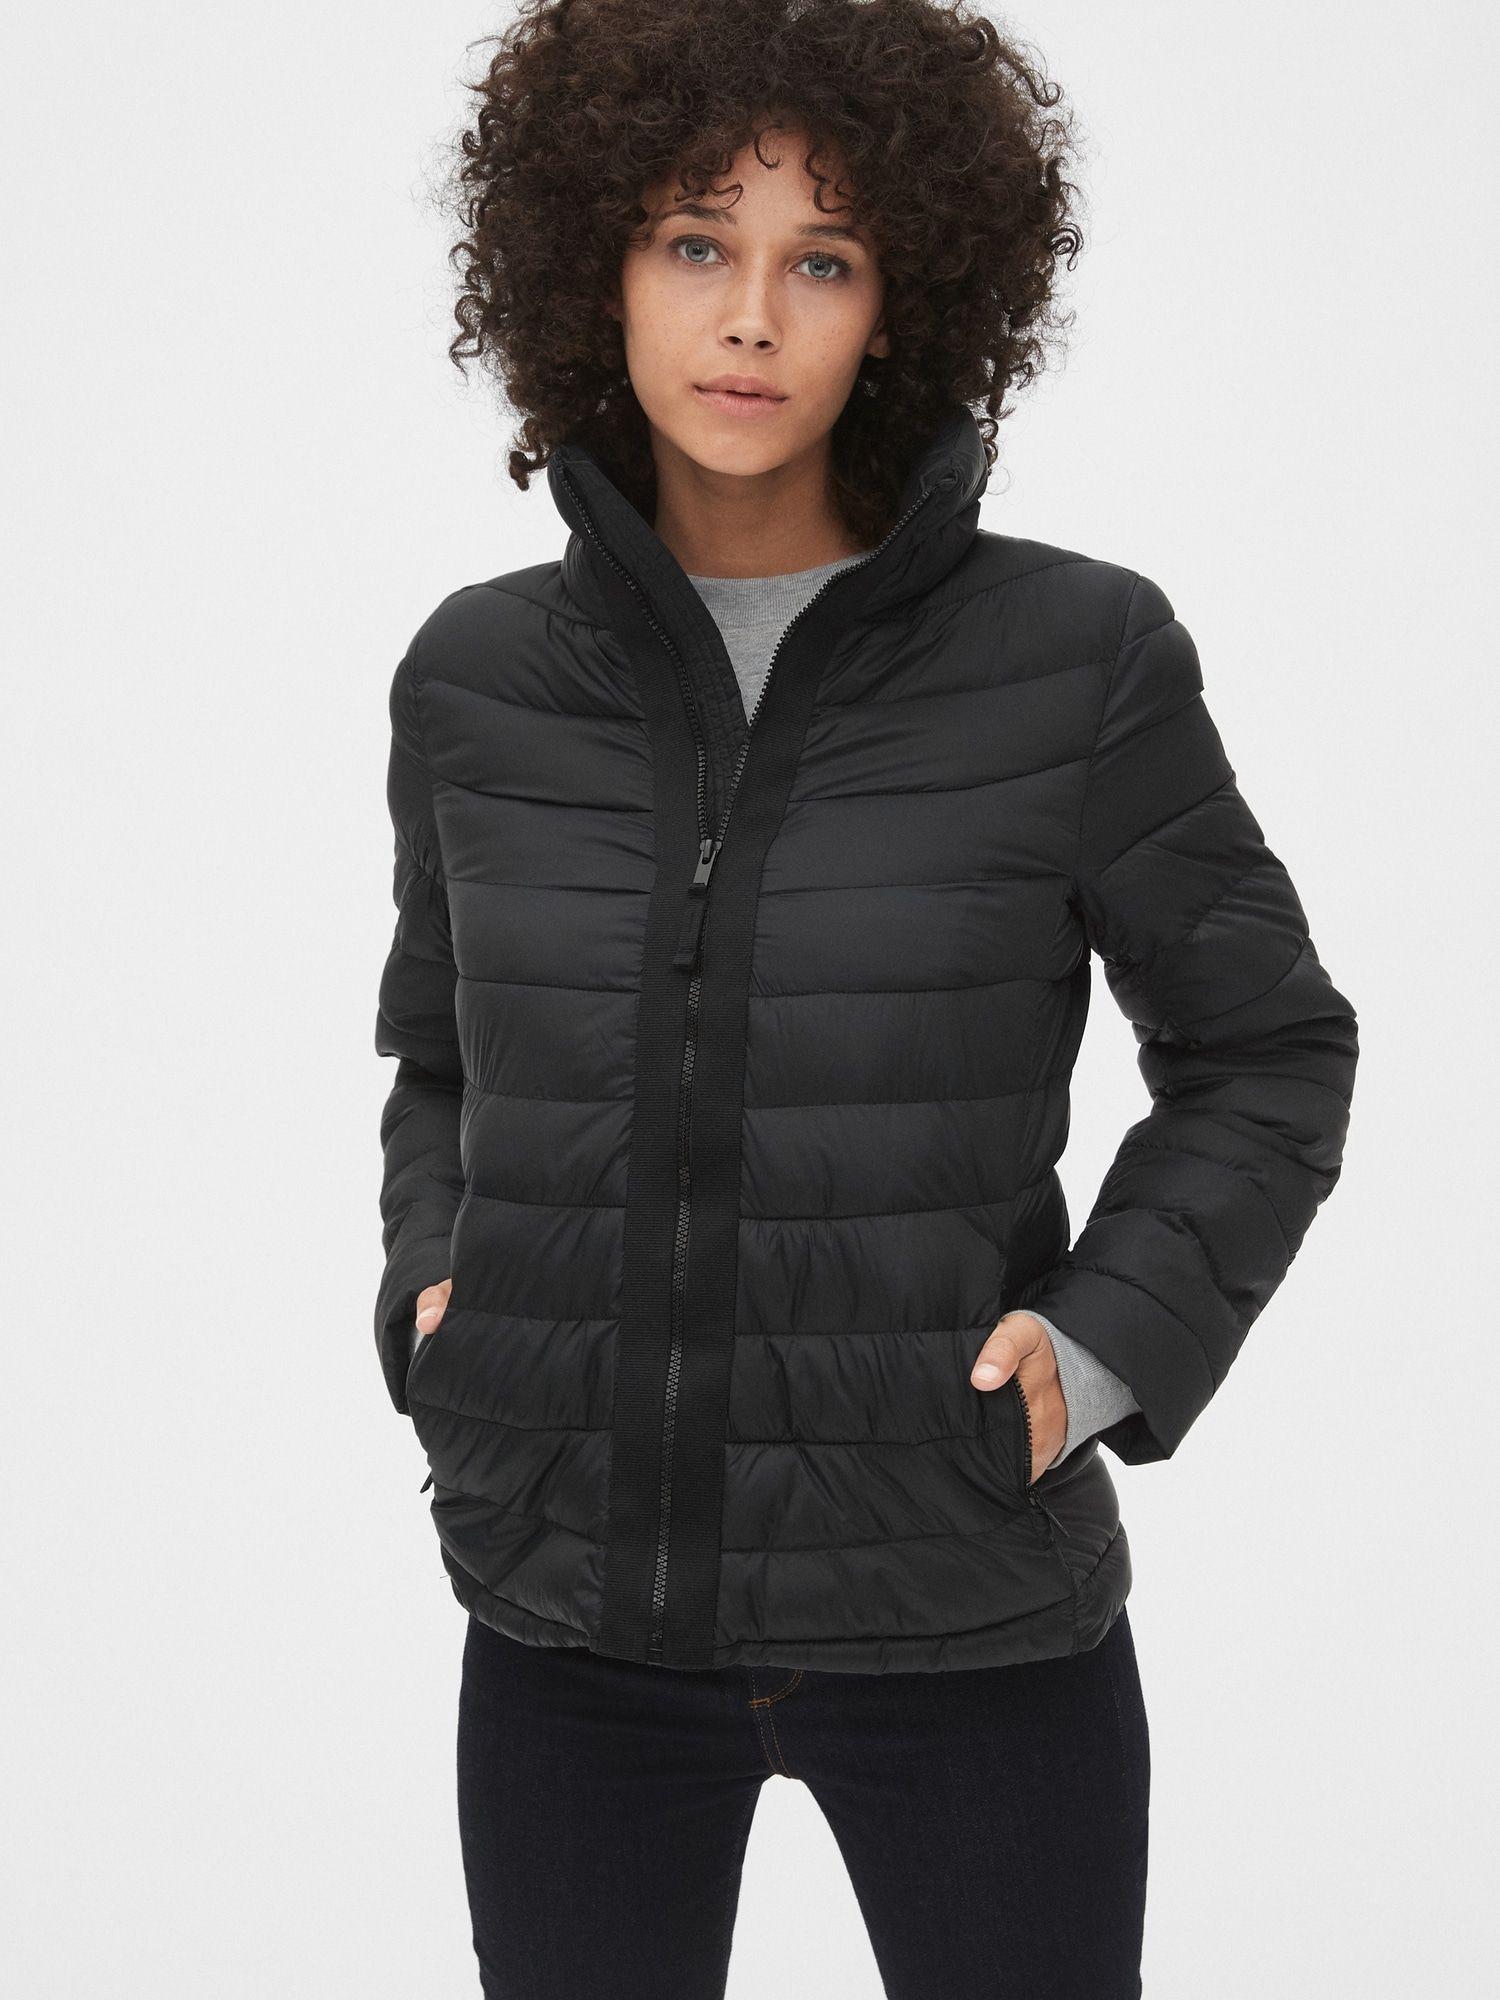 Coldcontrol Lightweight Puffer Jacket Gap Coats Jackets Women Jackets Stylish Outerwear [ 2000 x 1500 Pixel ]